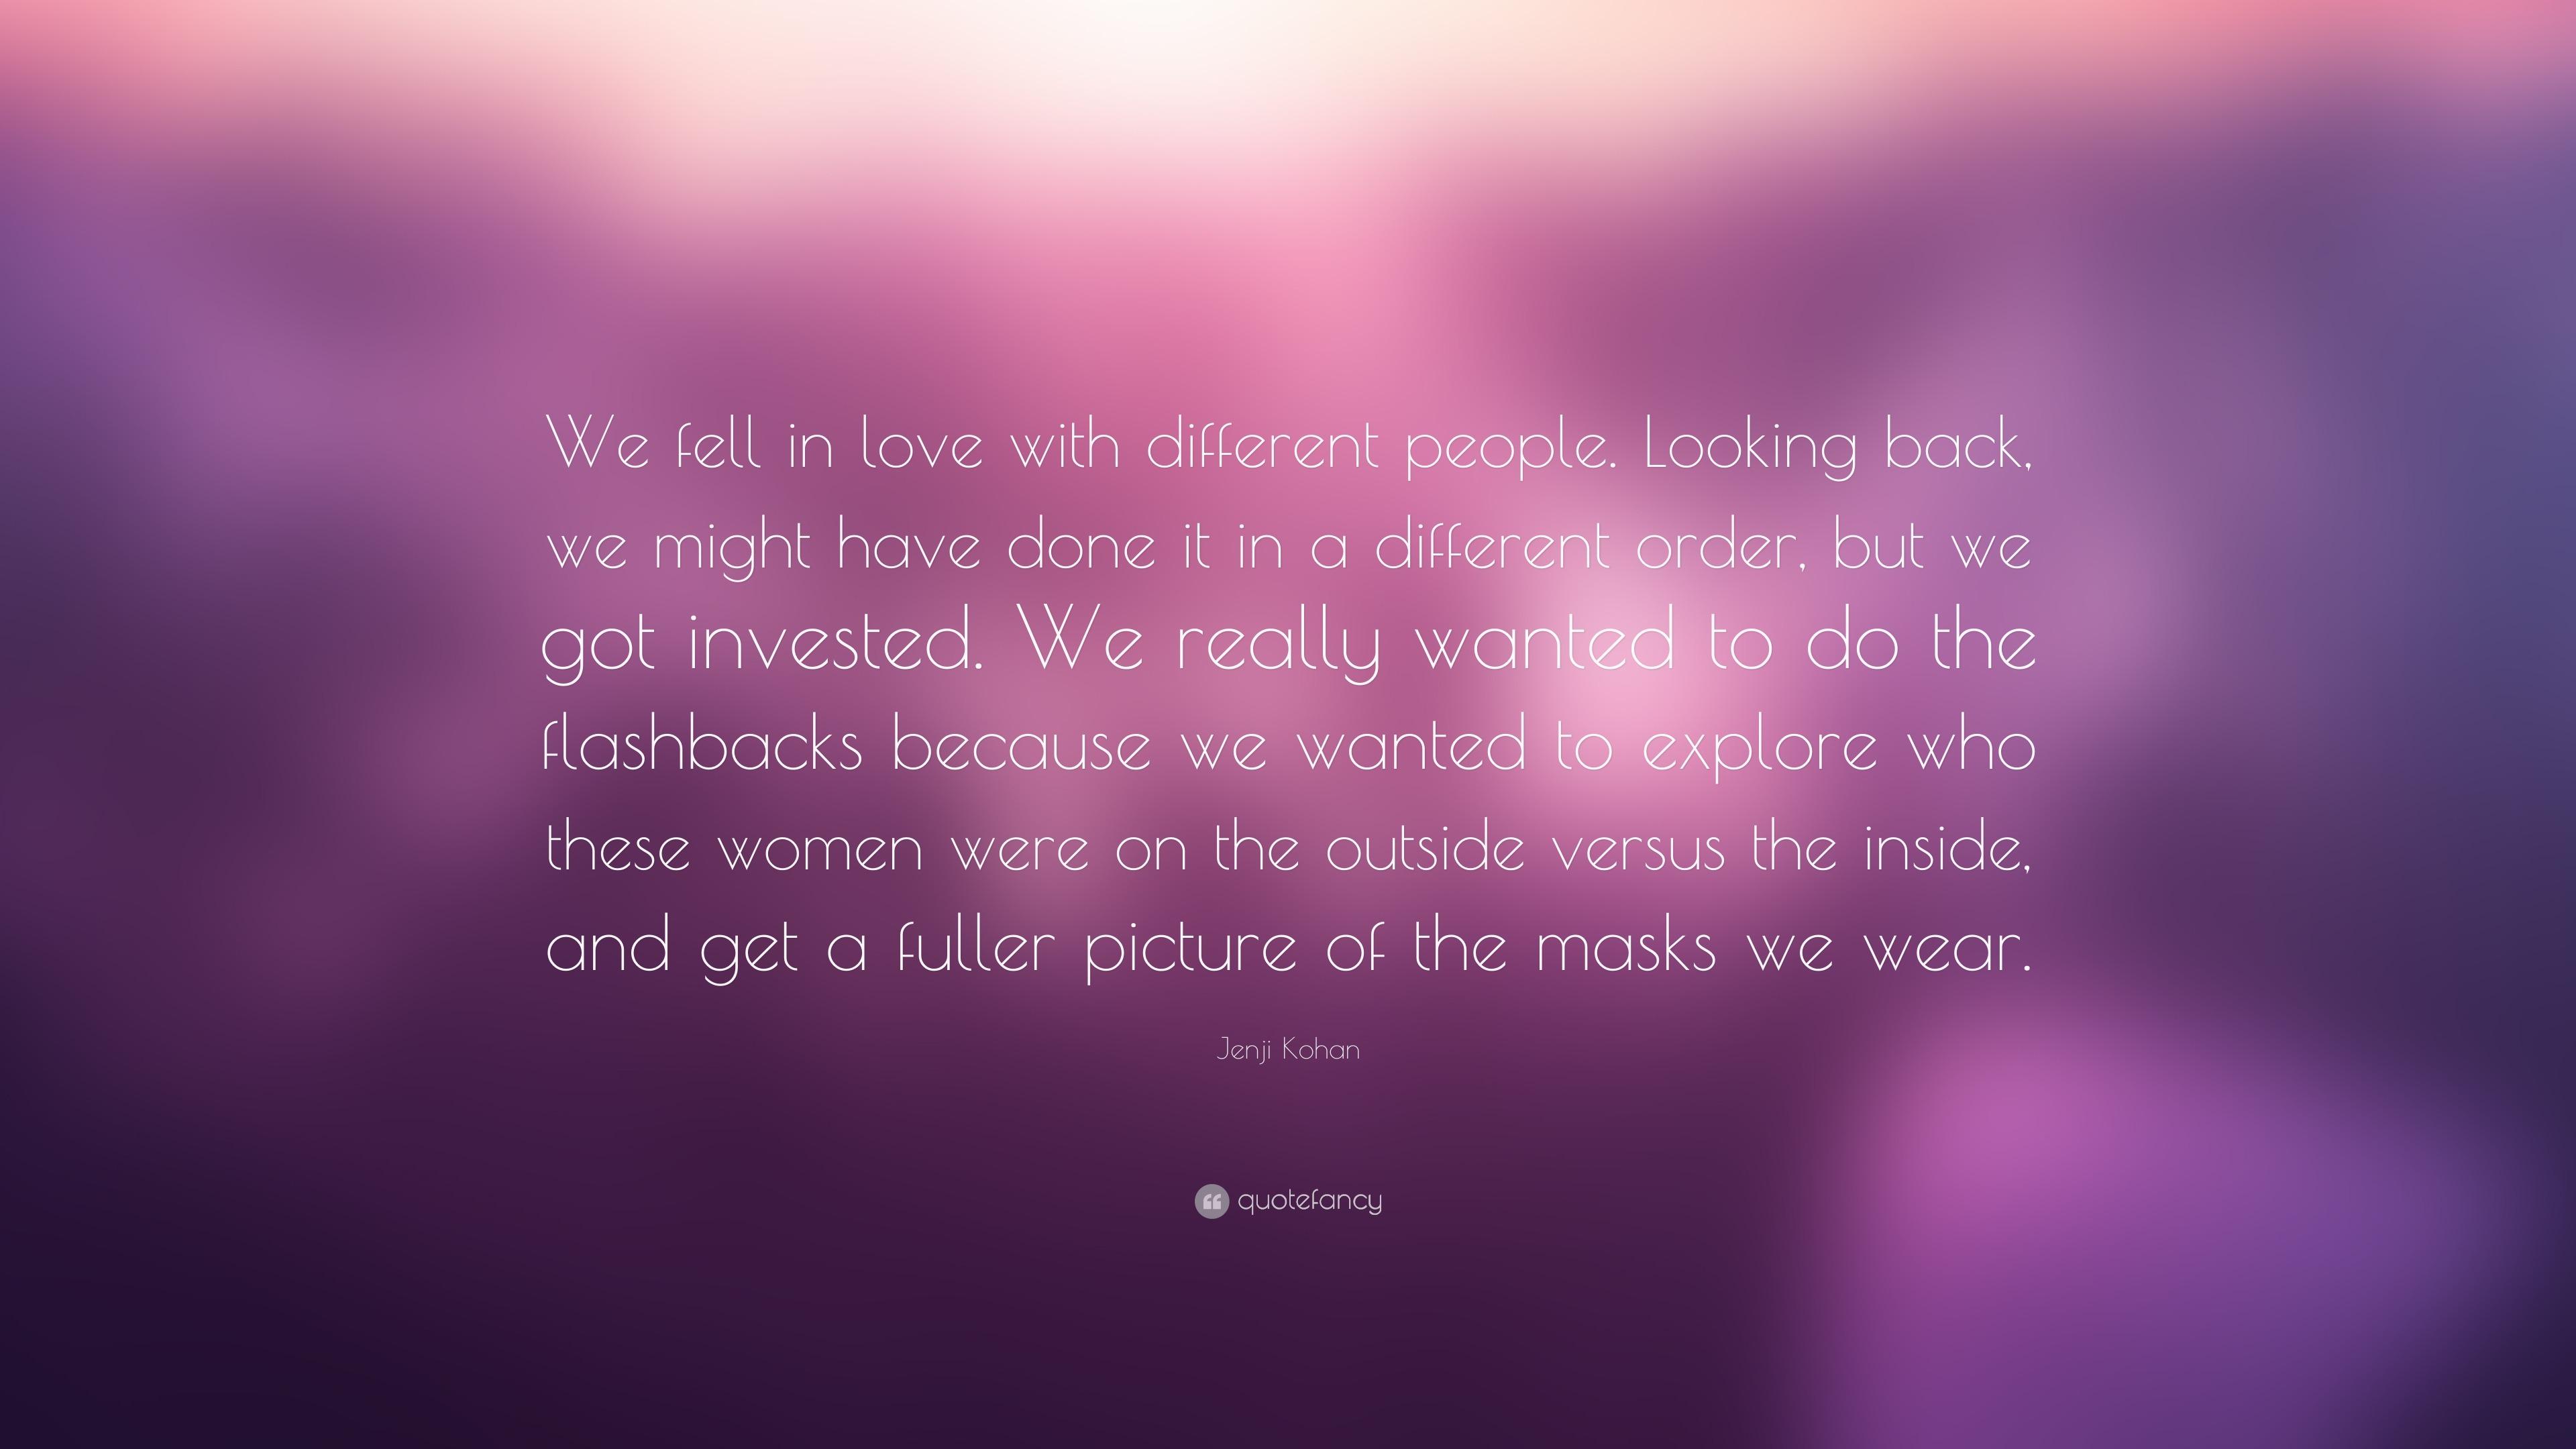 The Masks We Wear